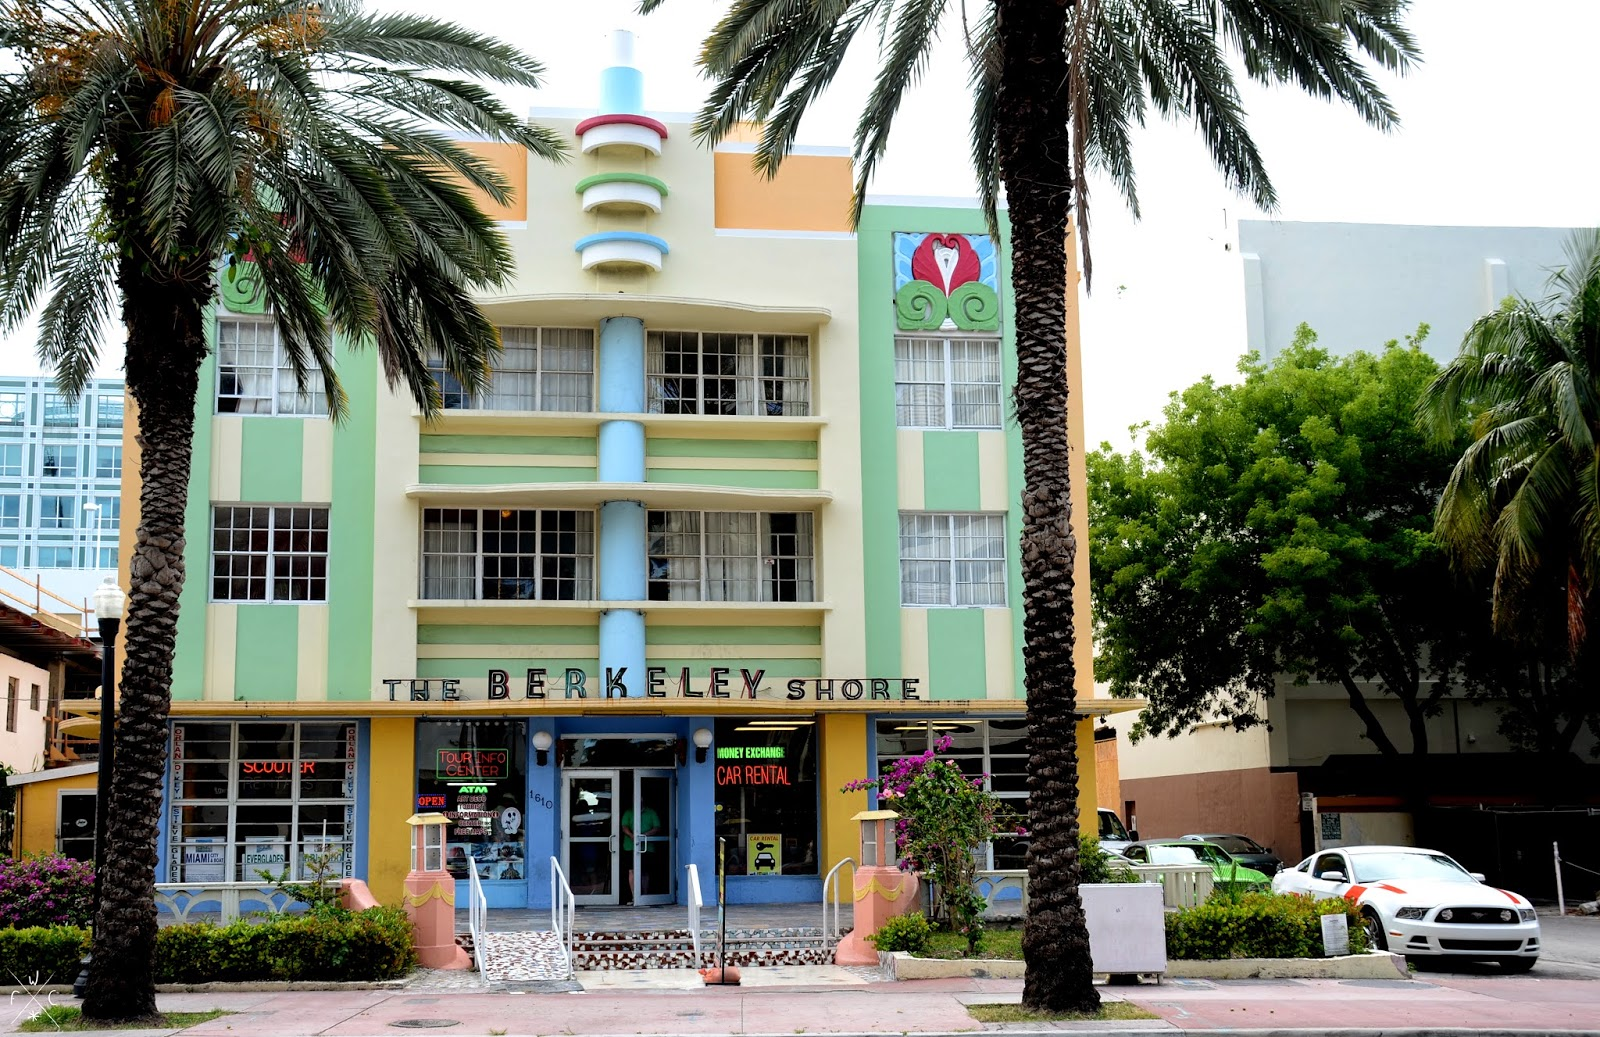 The Berkeley Shore - Miami Beach, Floride, USA - Art Déco